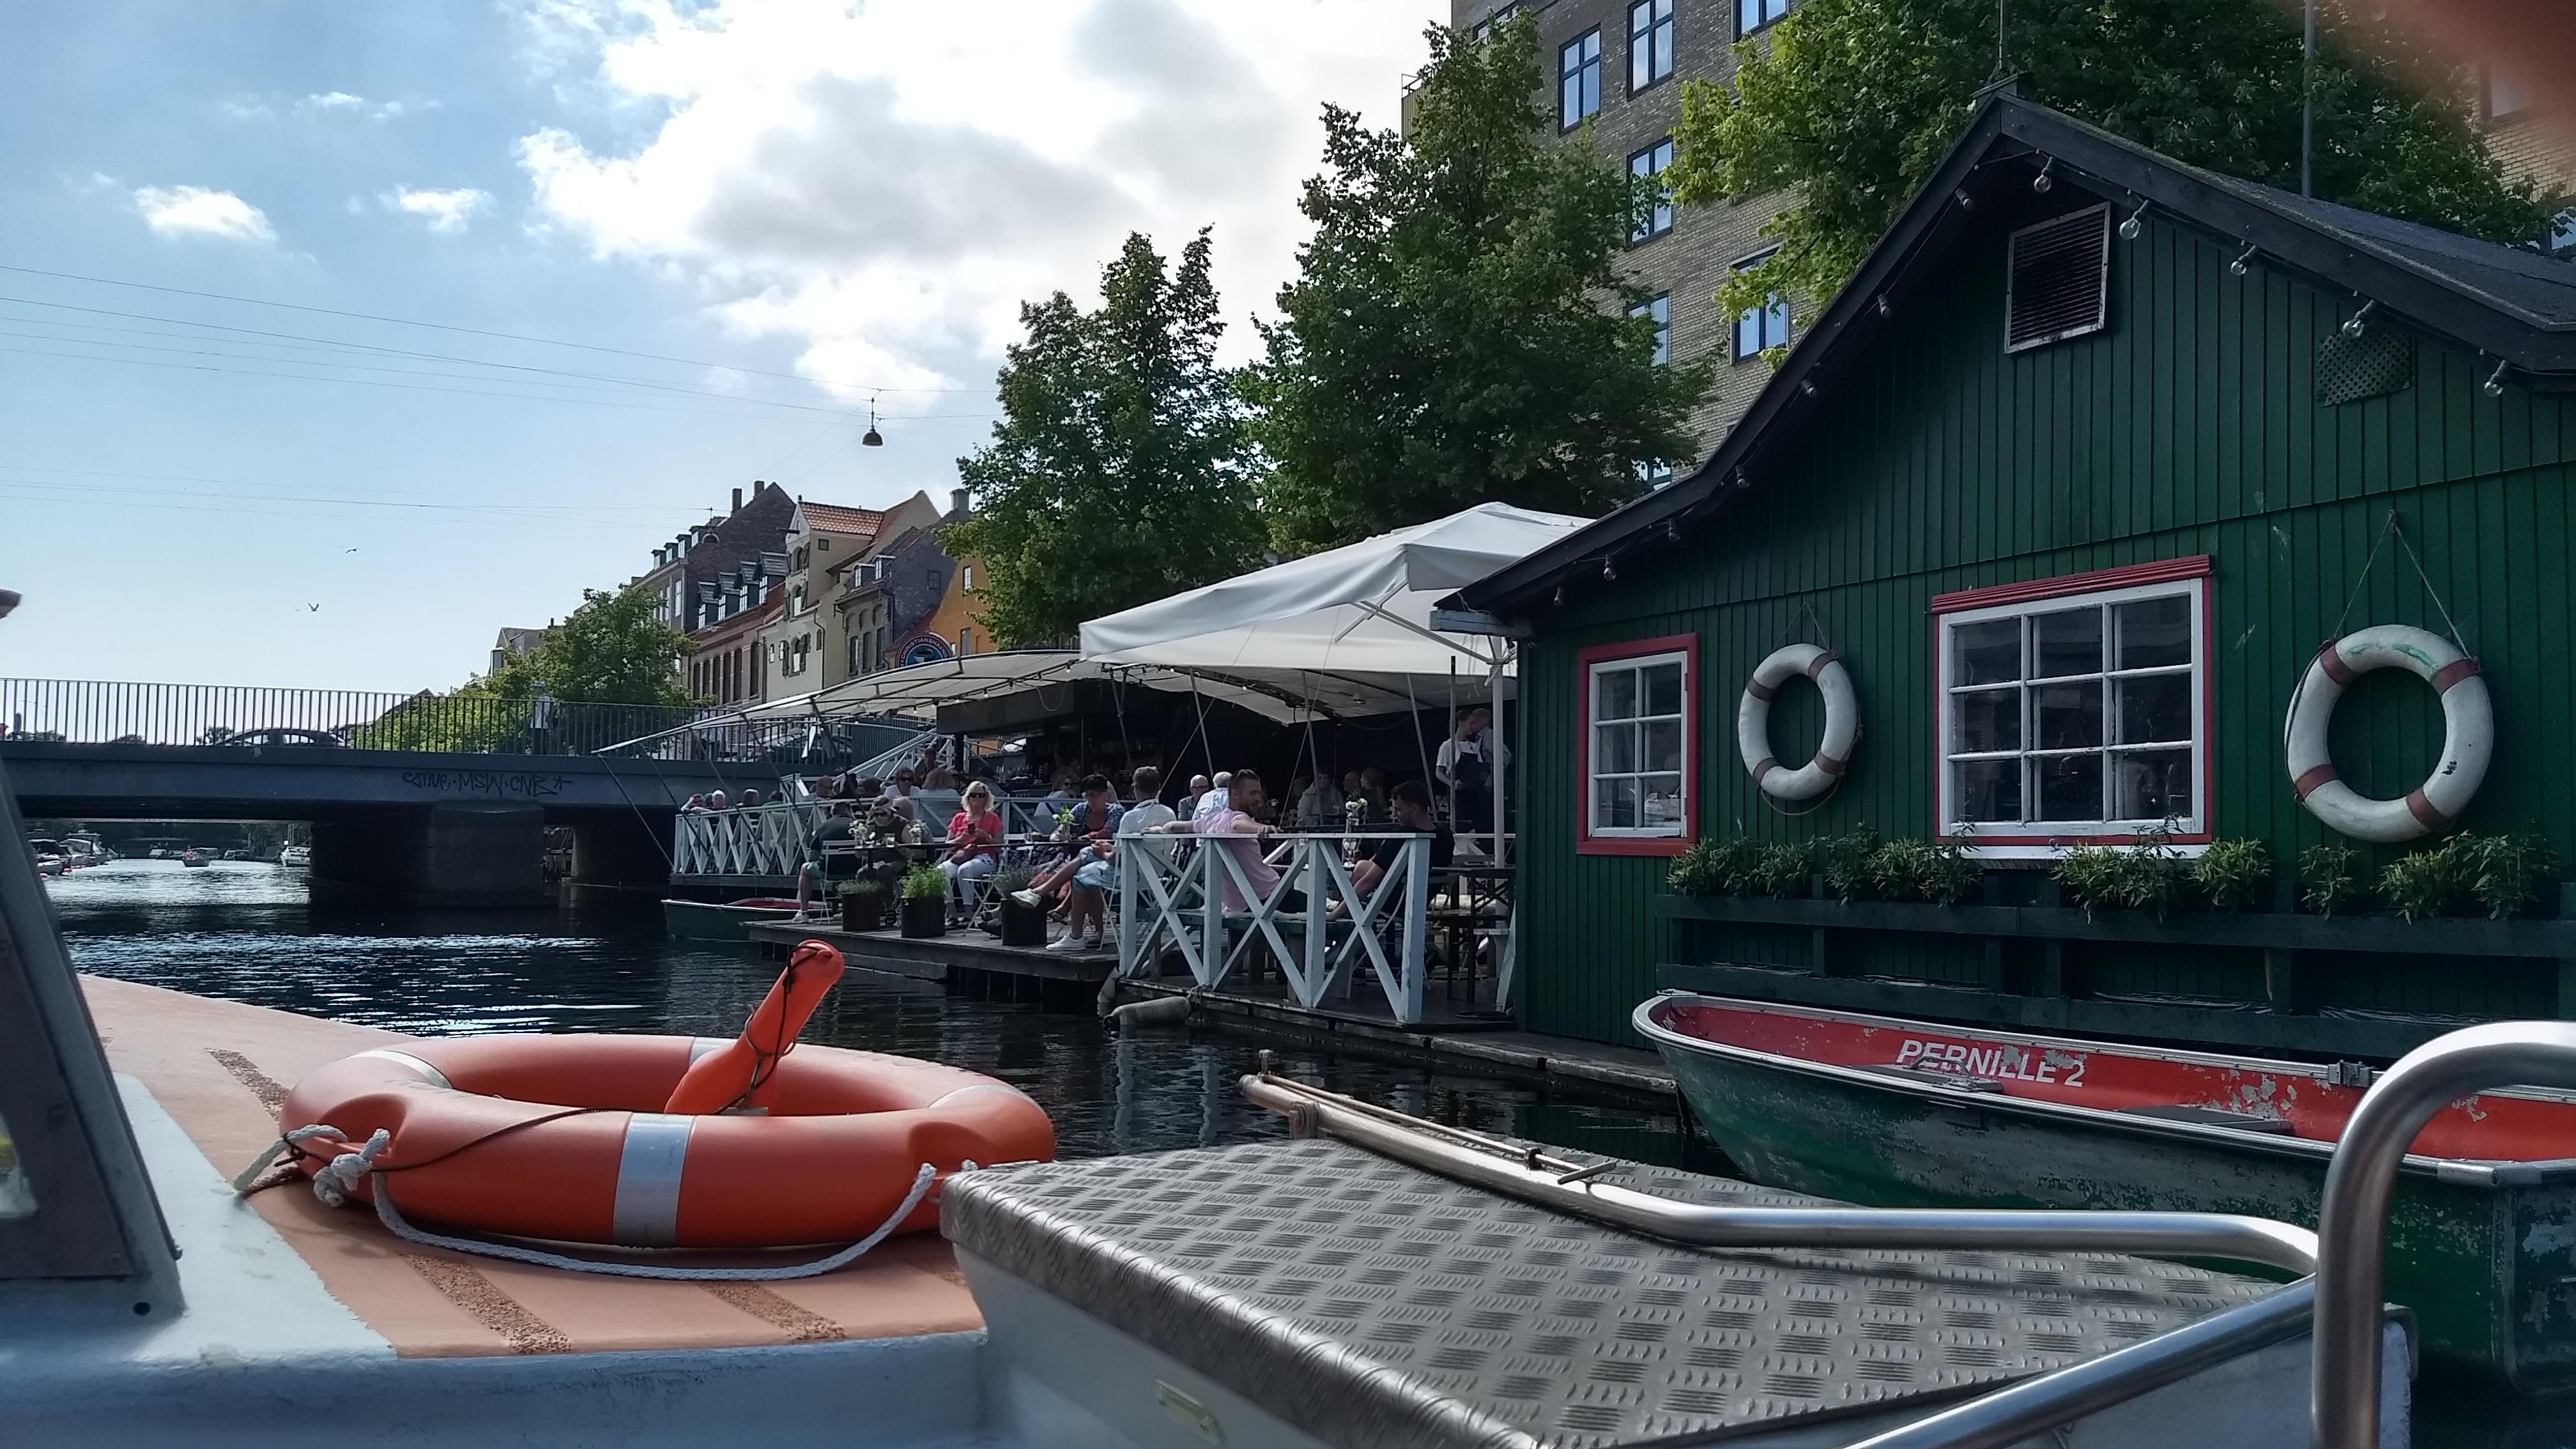 Christianshavns Bådudlejning & Café terras op water Kopenhagen